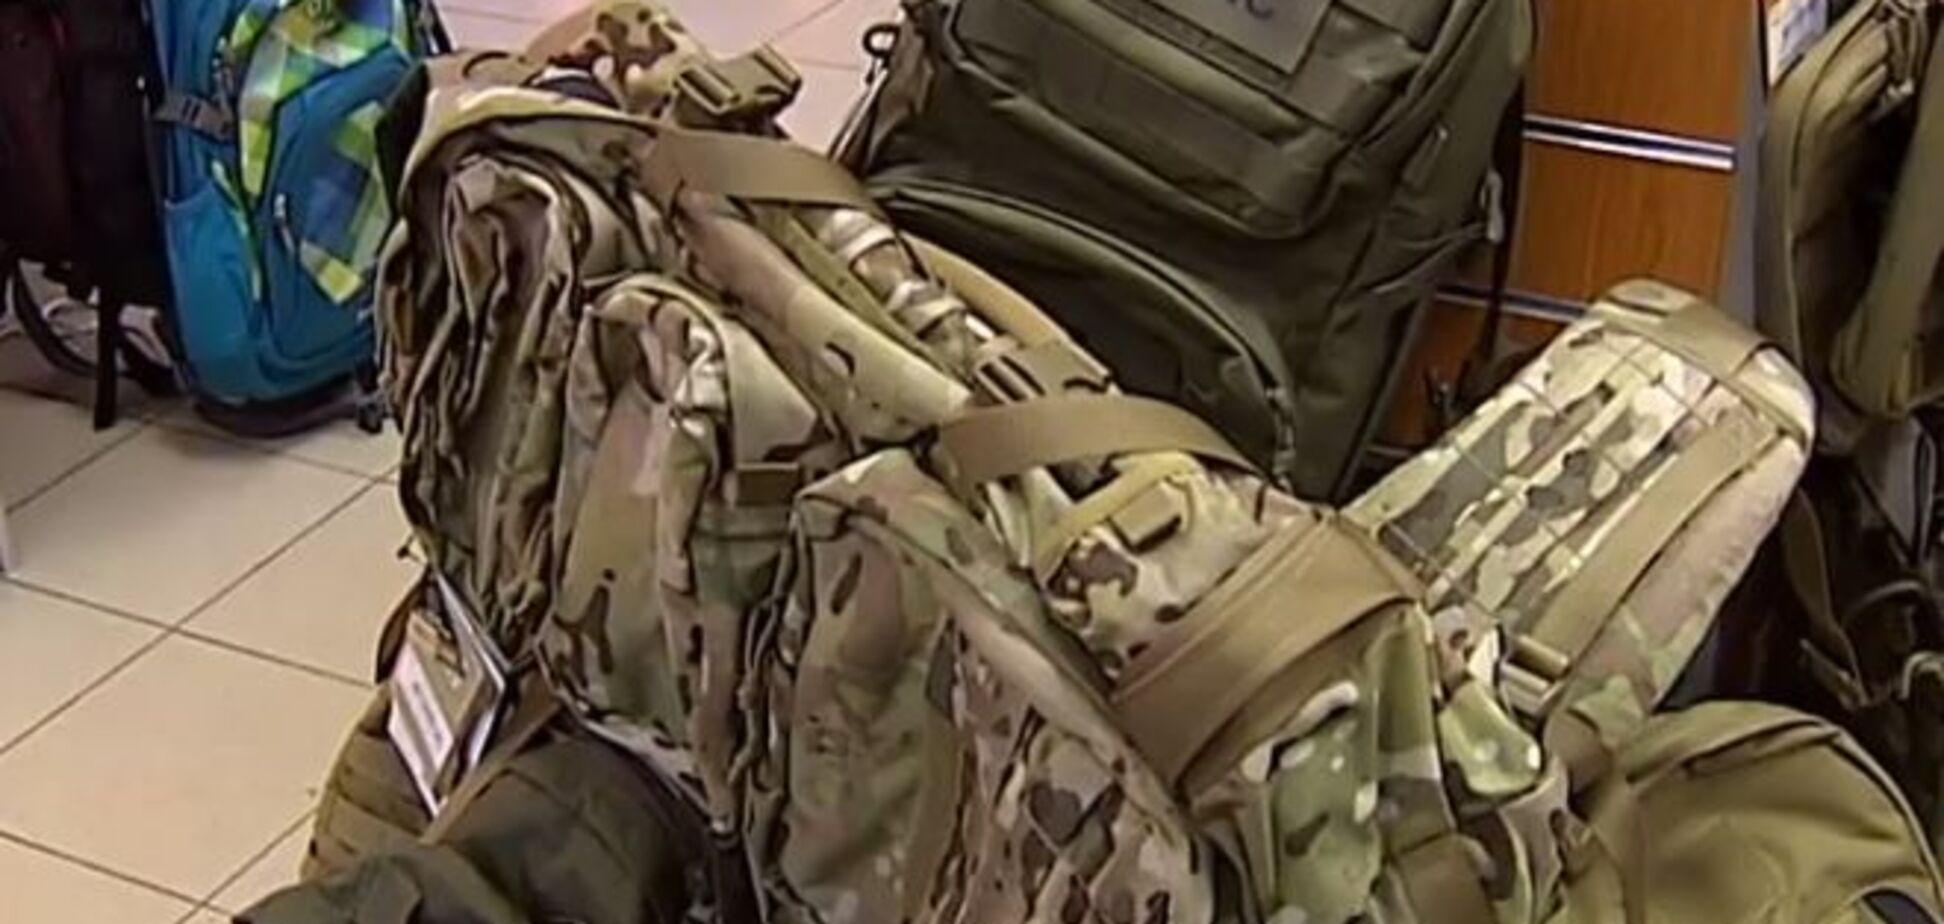 МВД купило рюкзаки для бойцов АТО на 14,5 млн грн через жену Авакова - СМИ